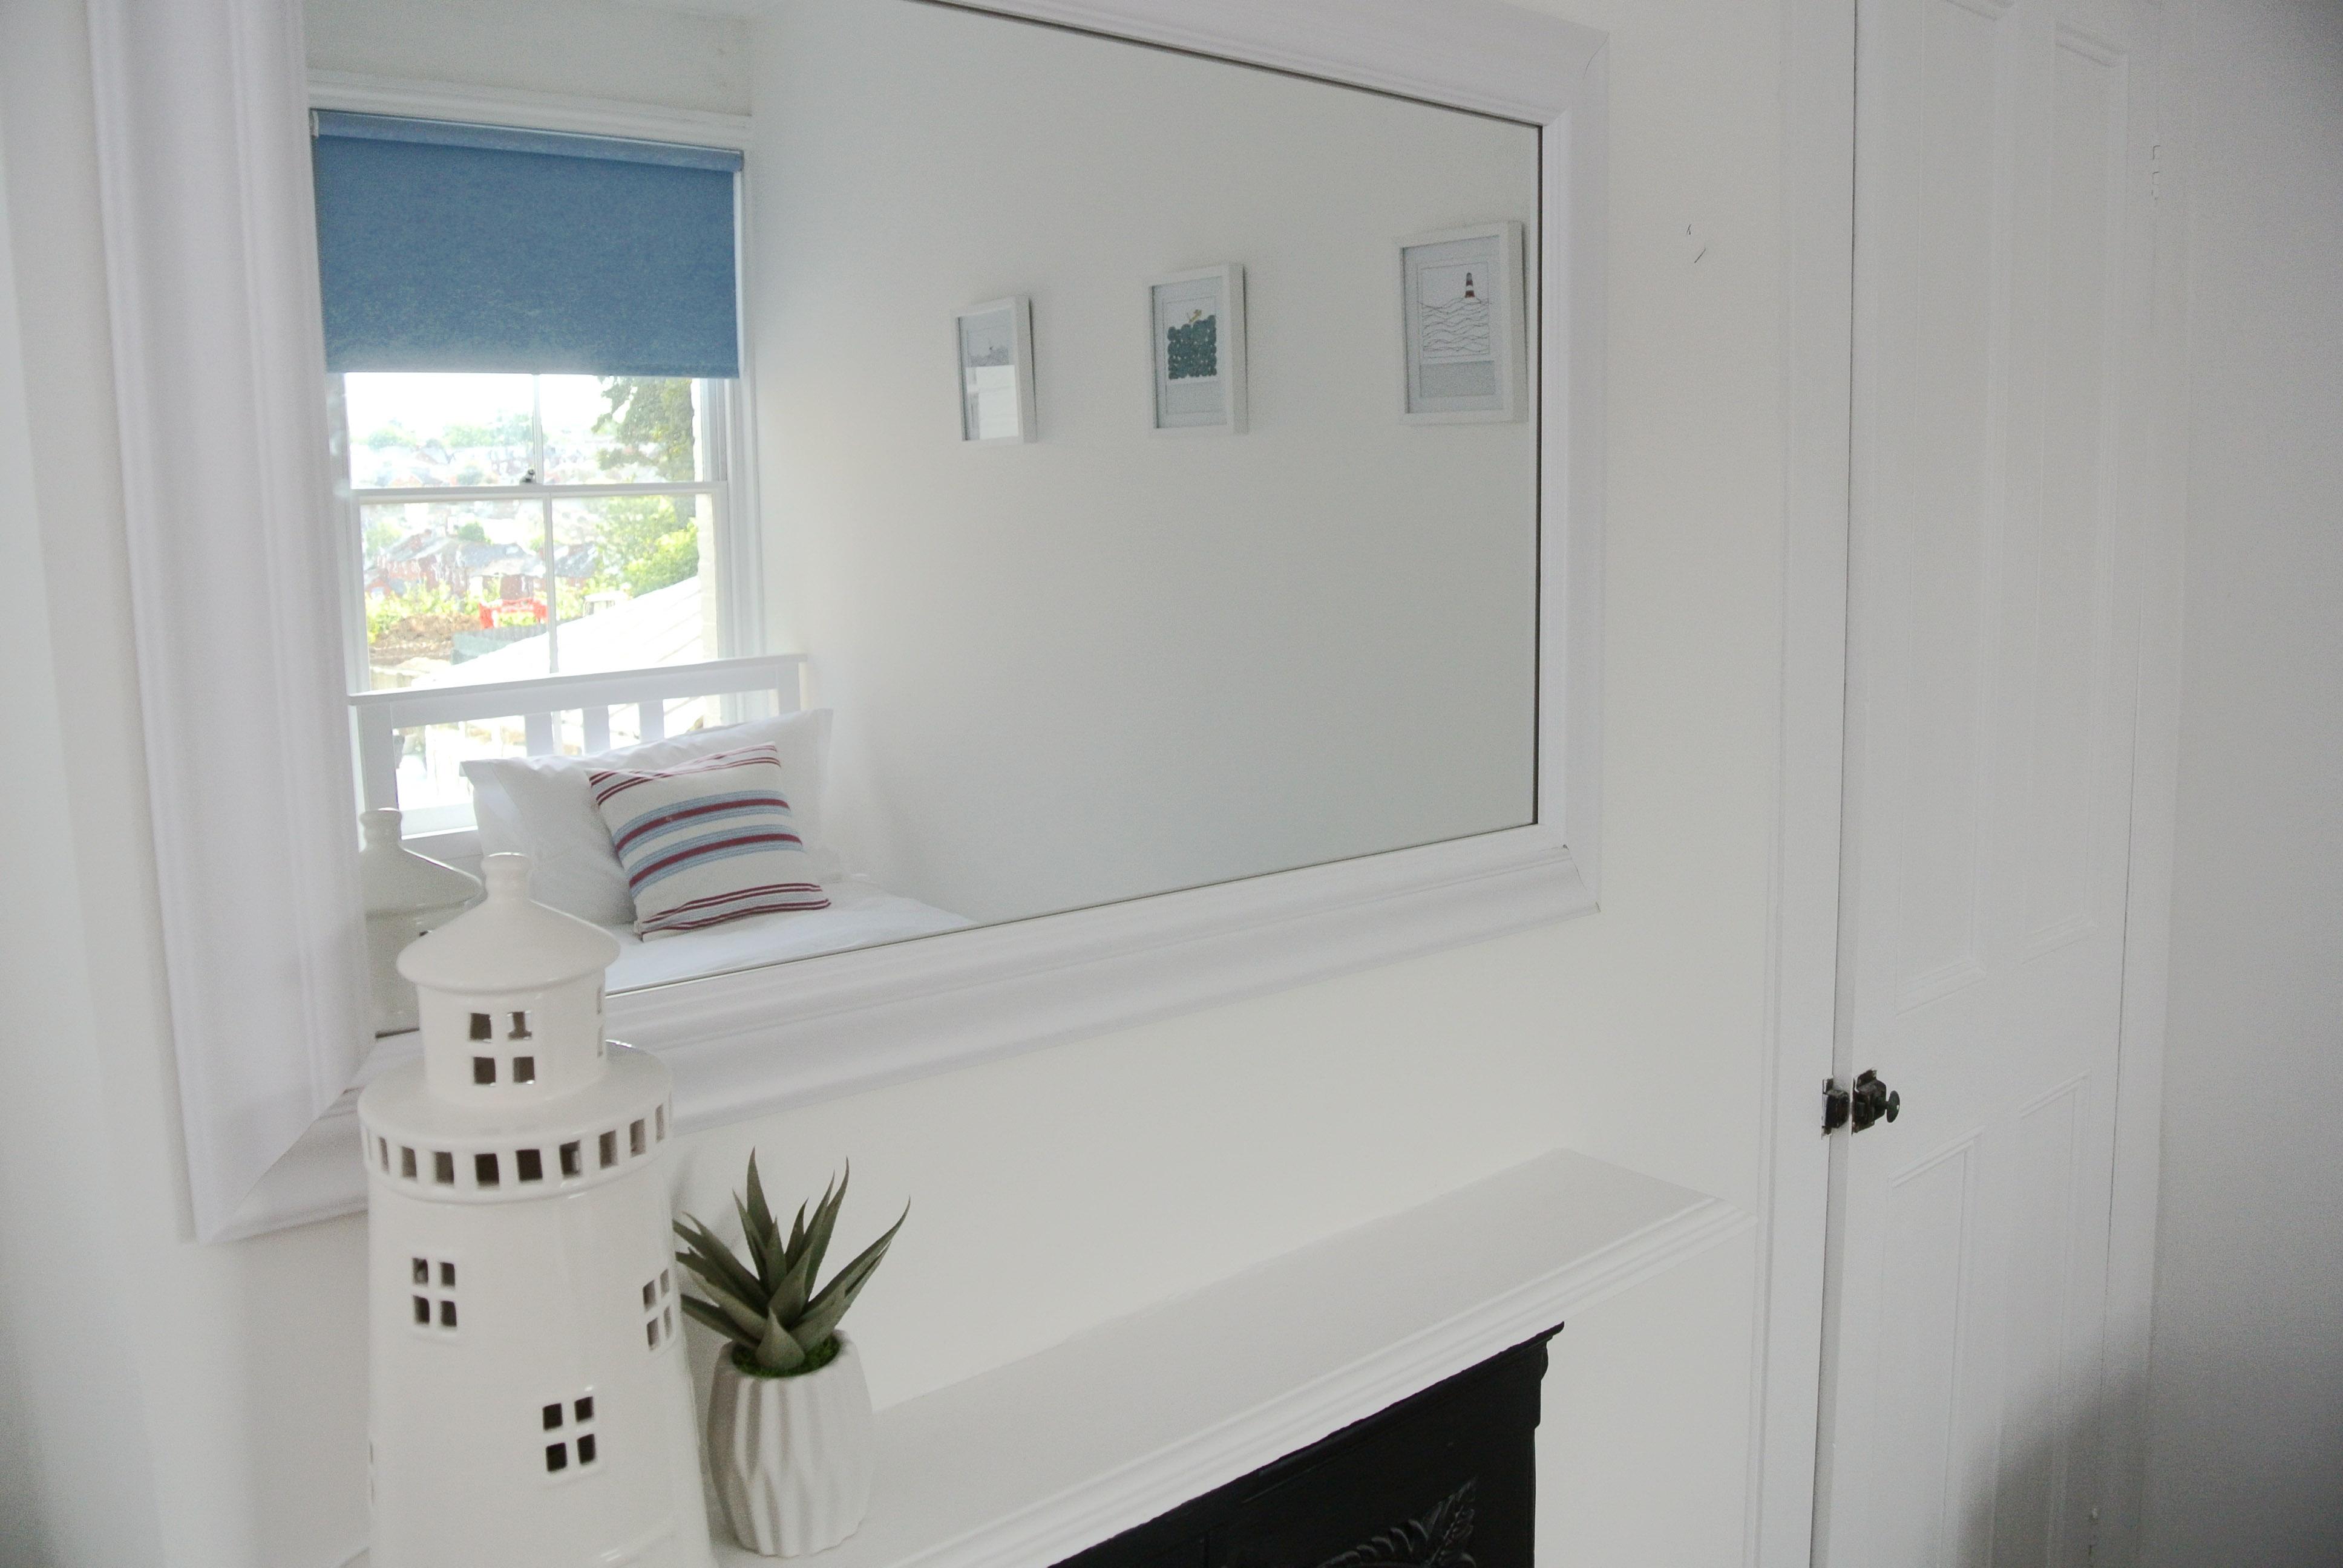 Jolly Boat mirror